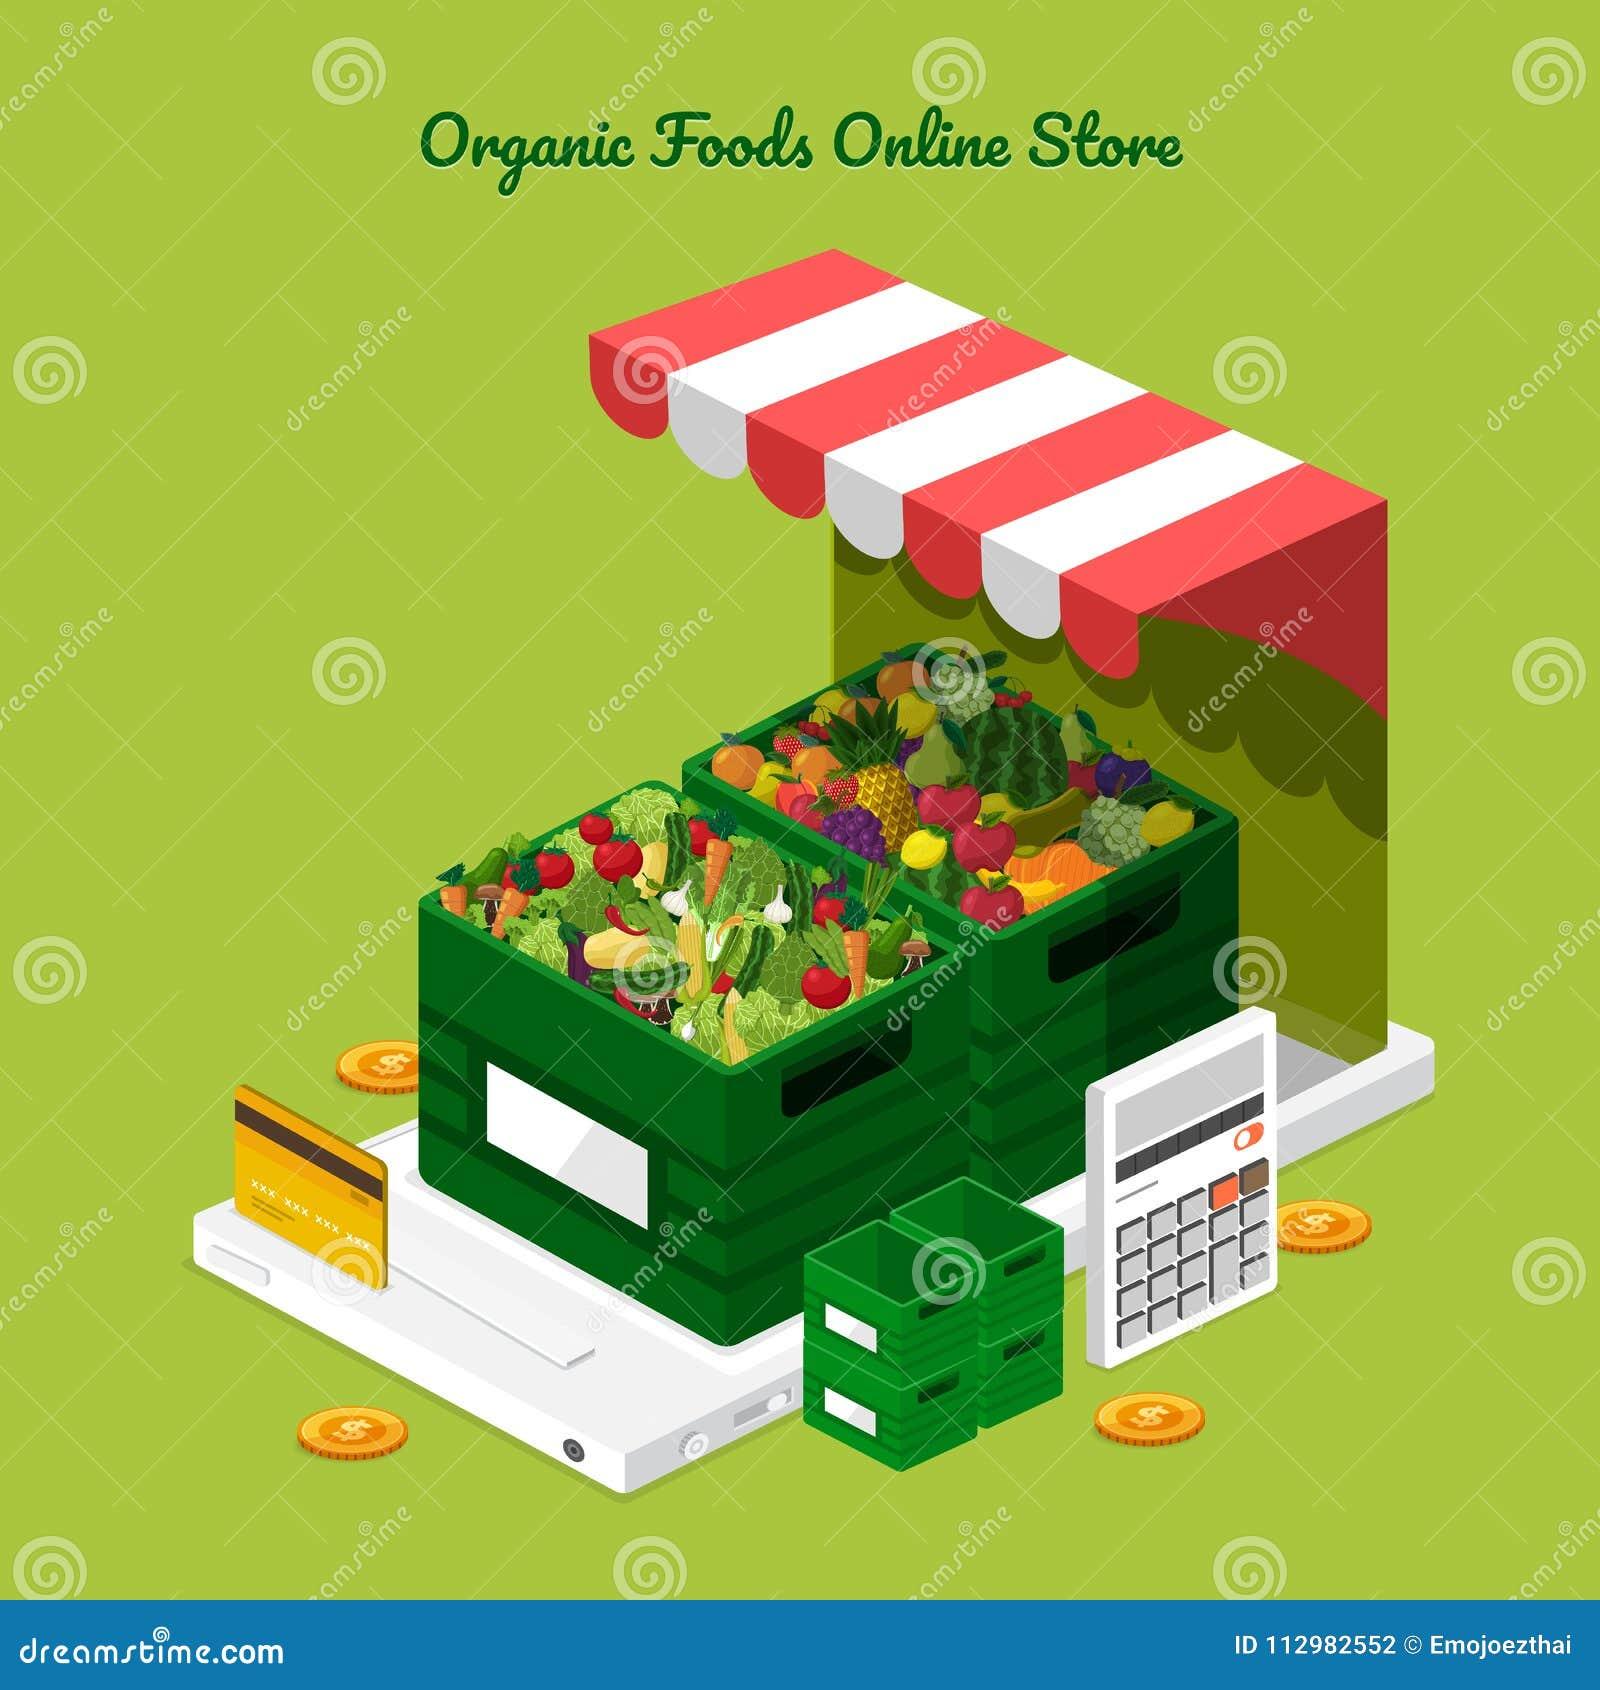 Fruits & Vegetables Online Store